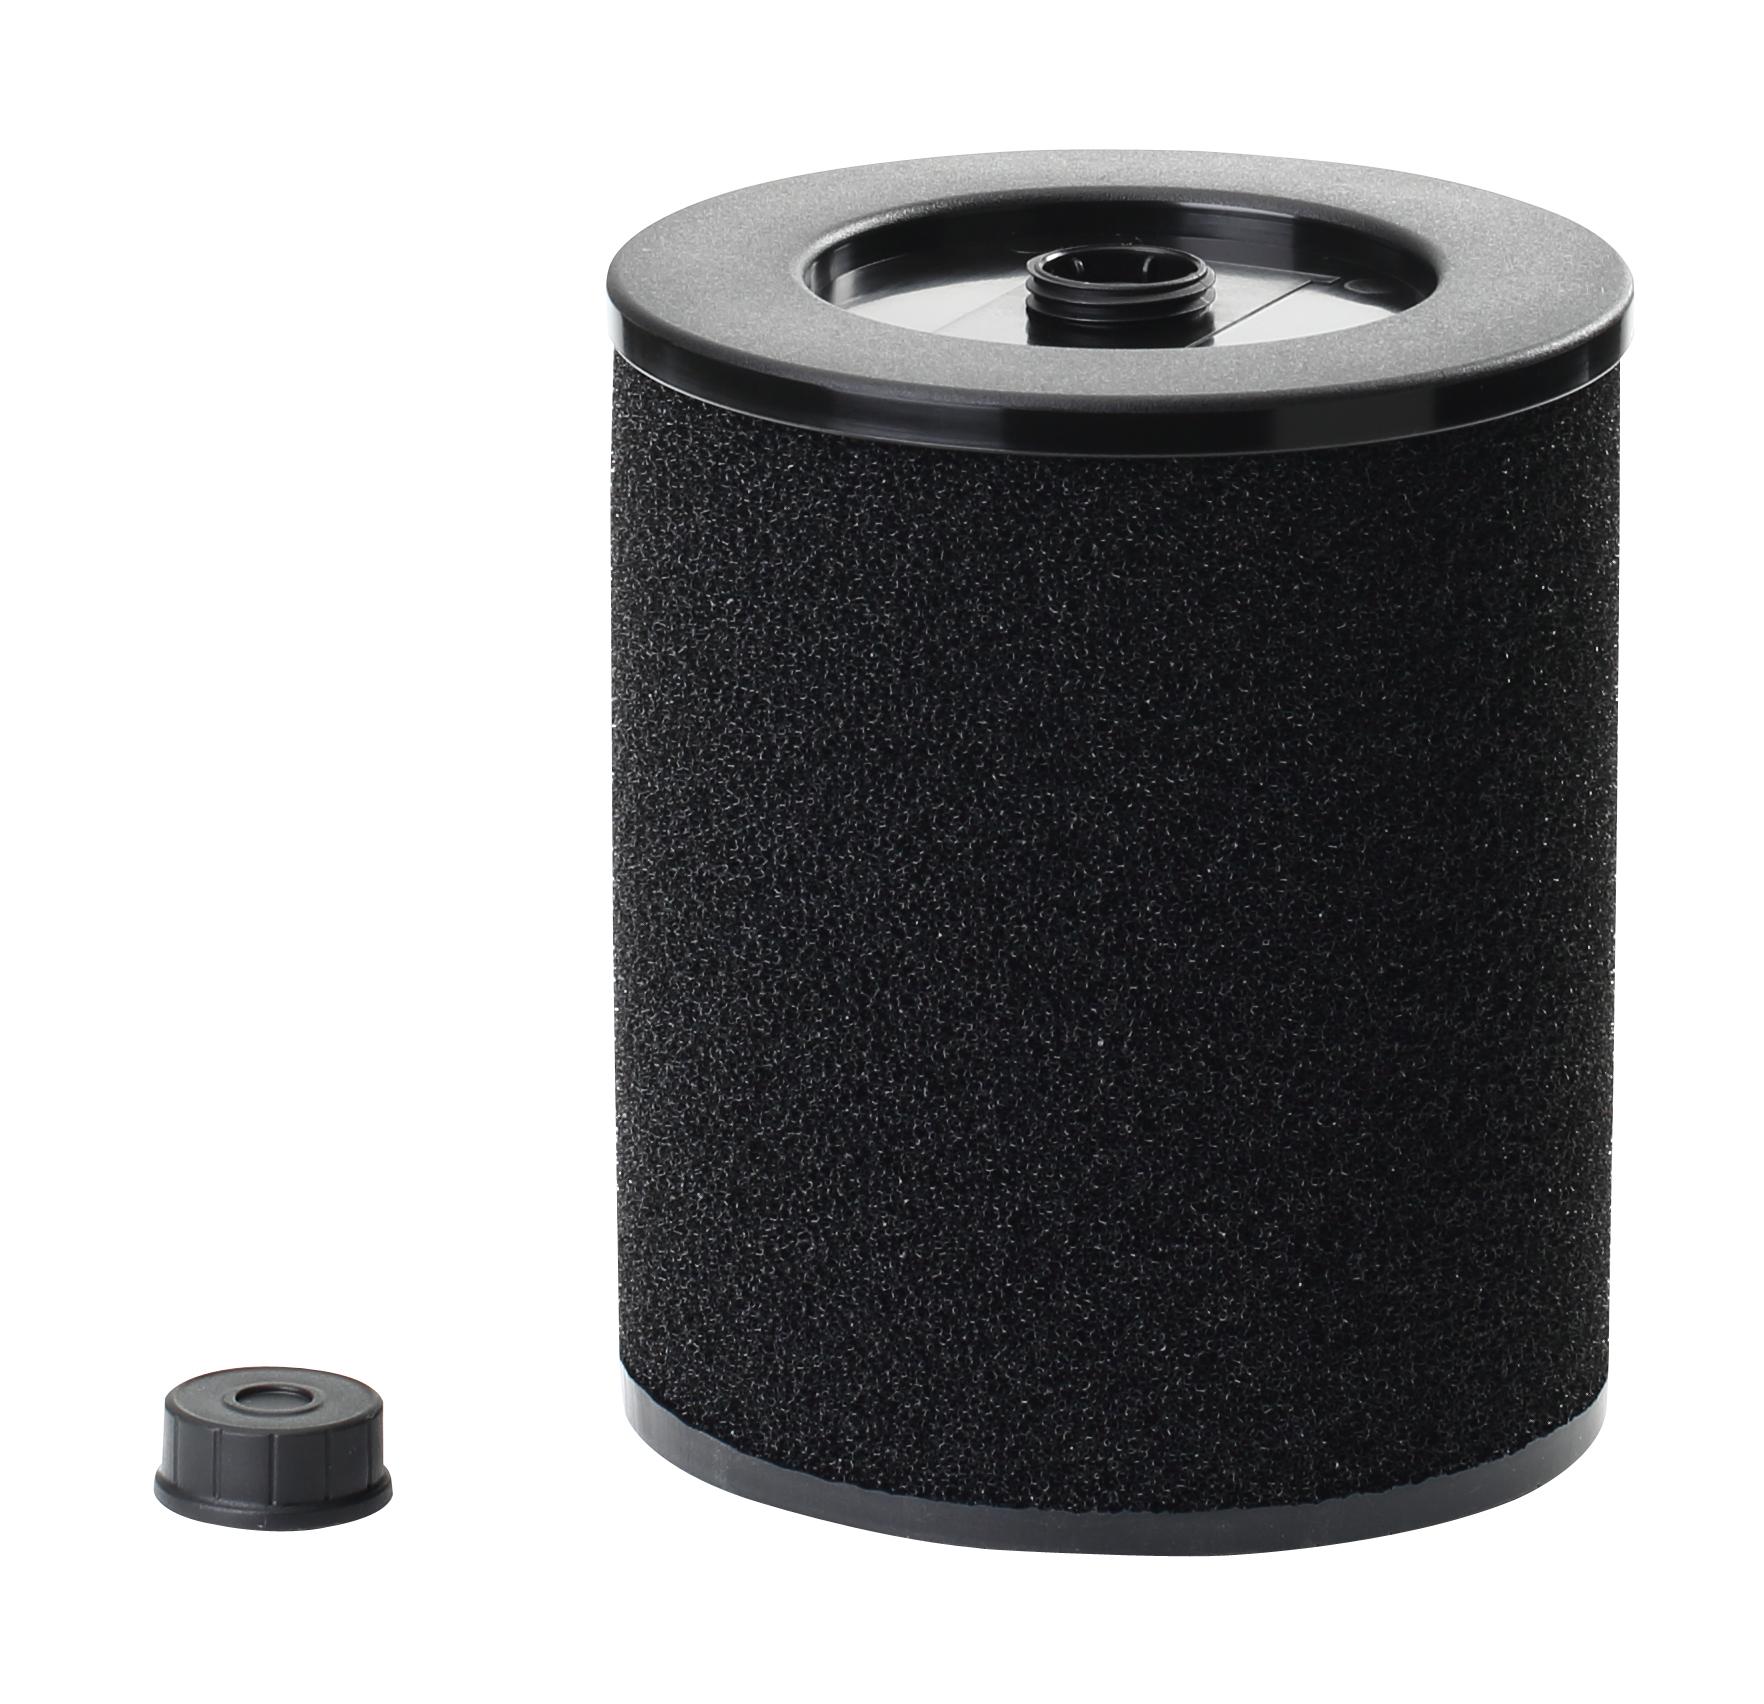 Sears Craftsman Wet Dry Vac 16 Gallon Filter